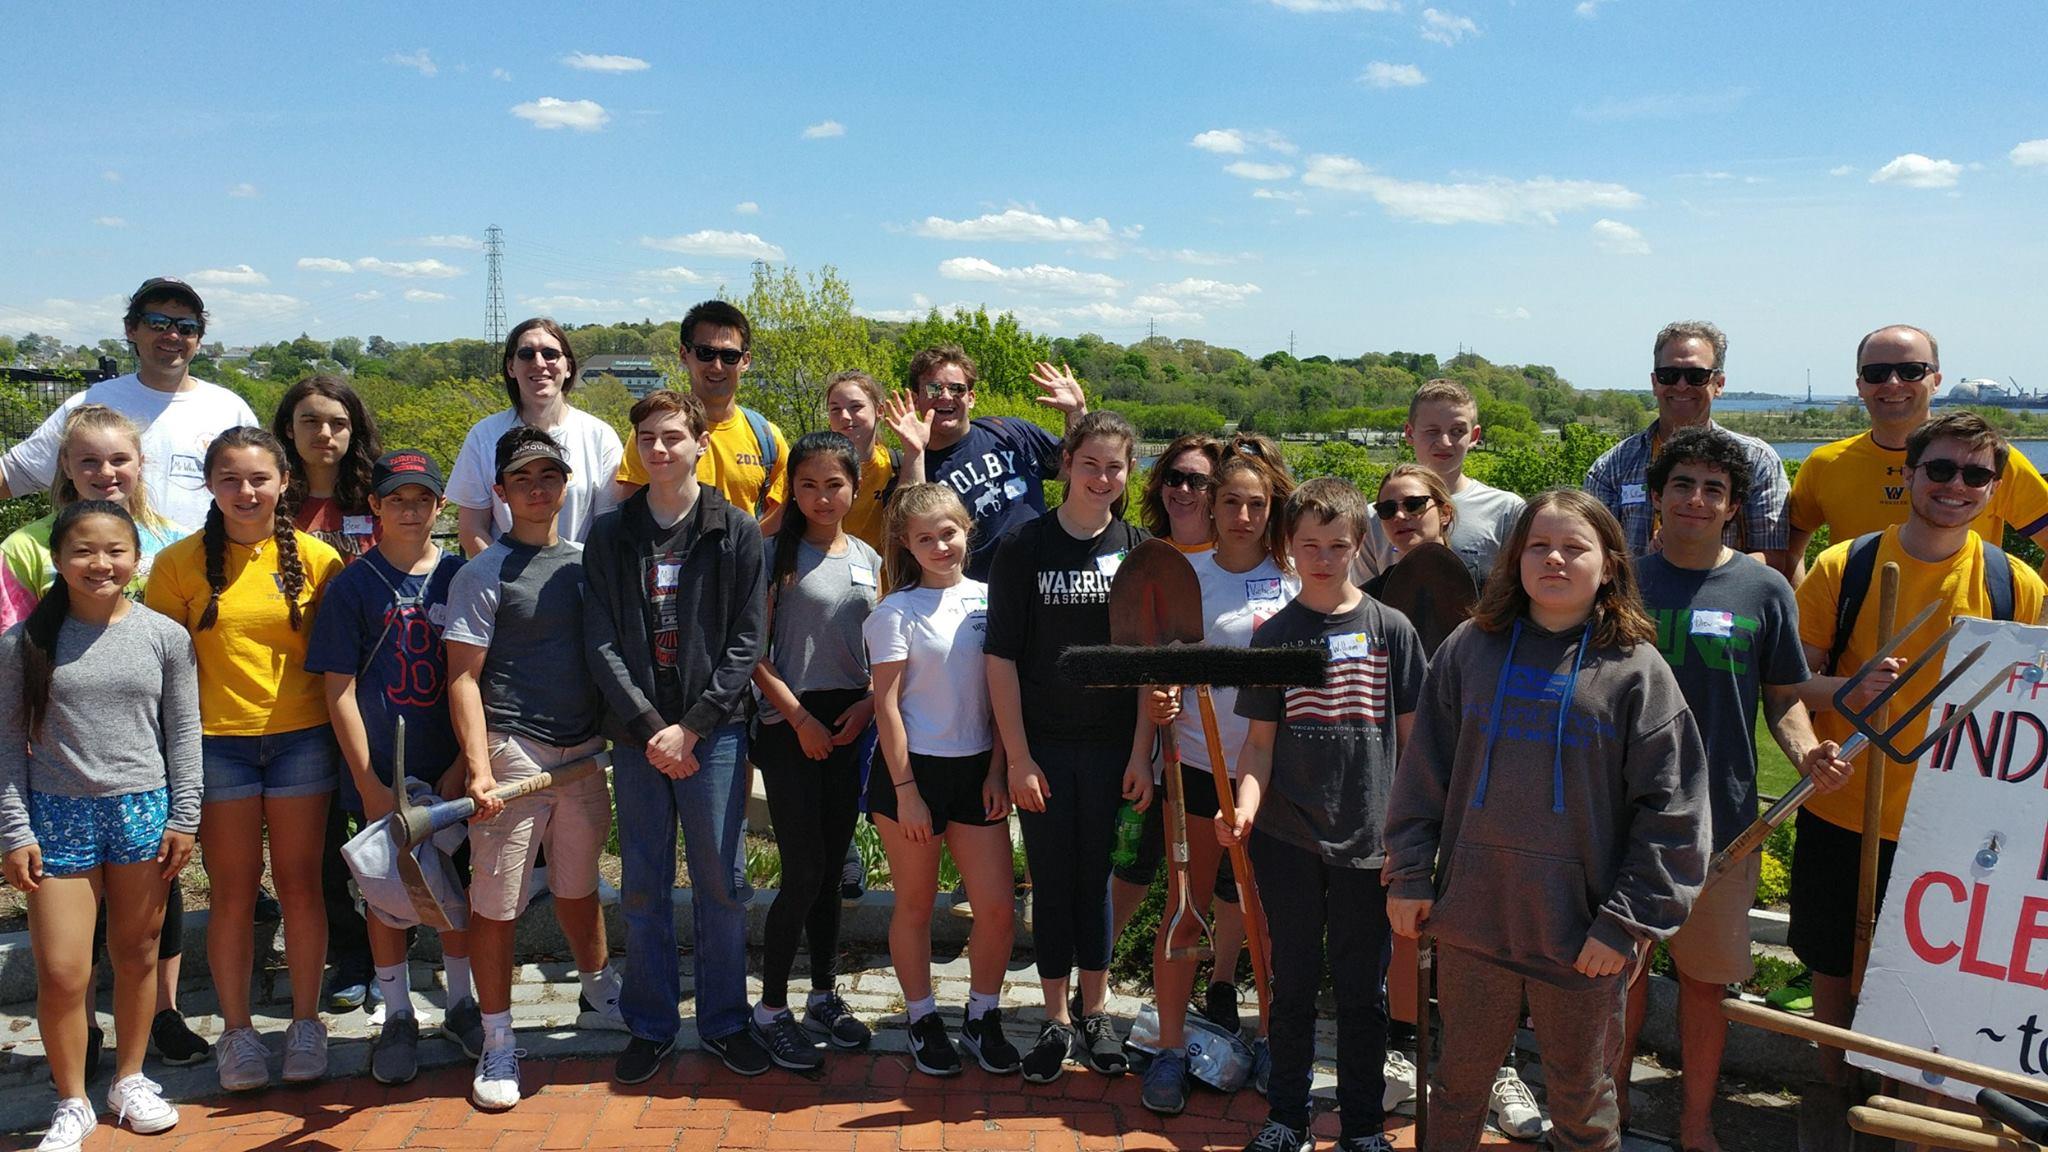 Wheeler School Planting and Weeding, May 11